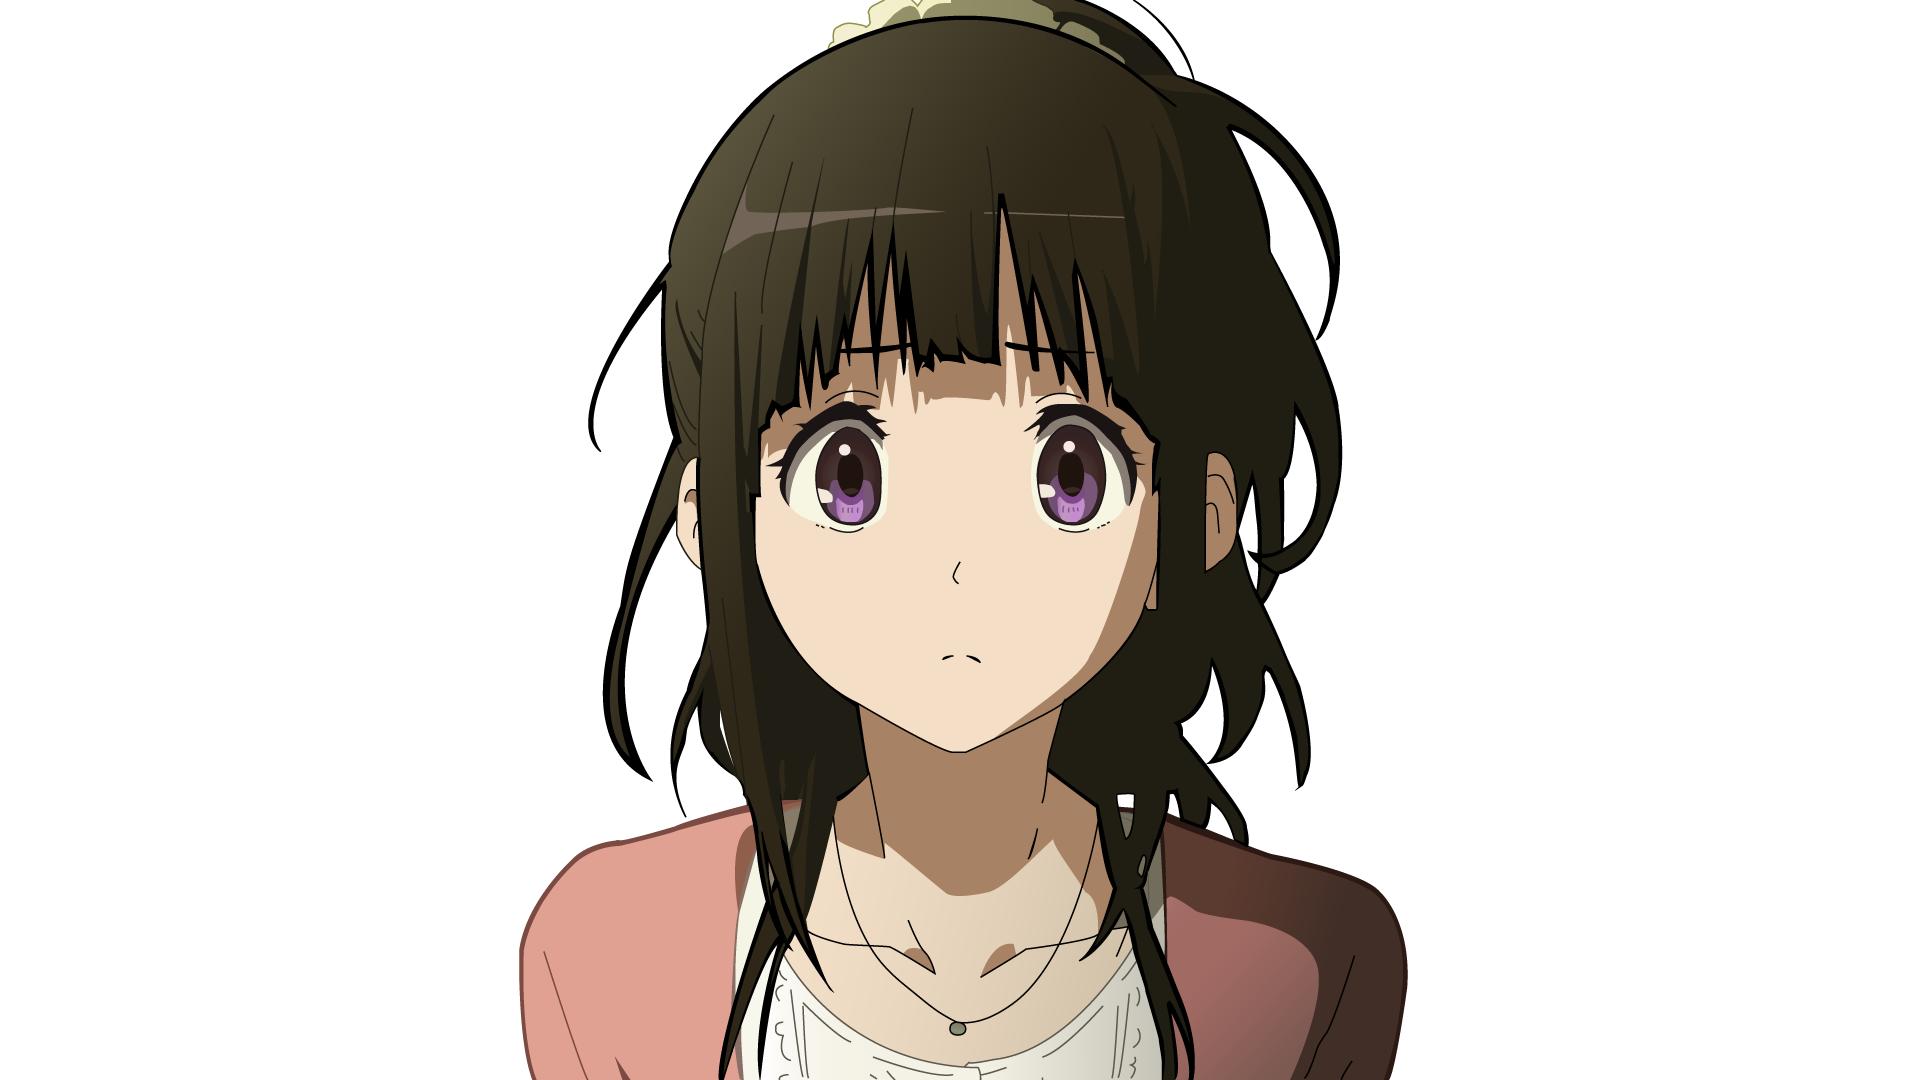 Anime Hyouka Eru Chitanda Wallpaper Anime, Personagens